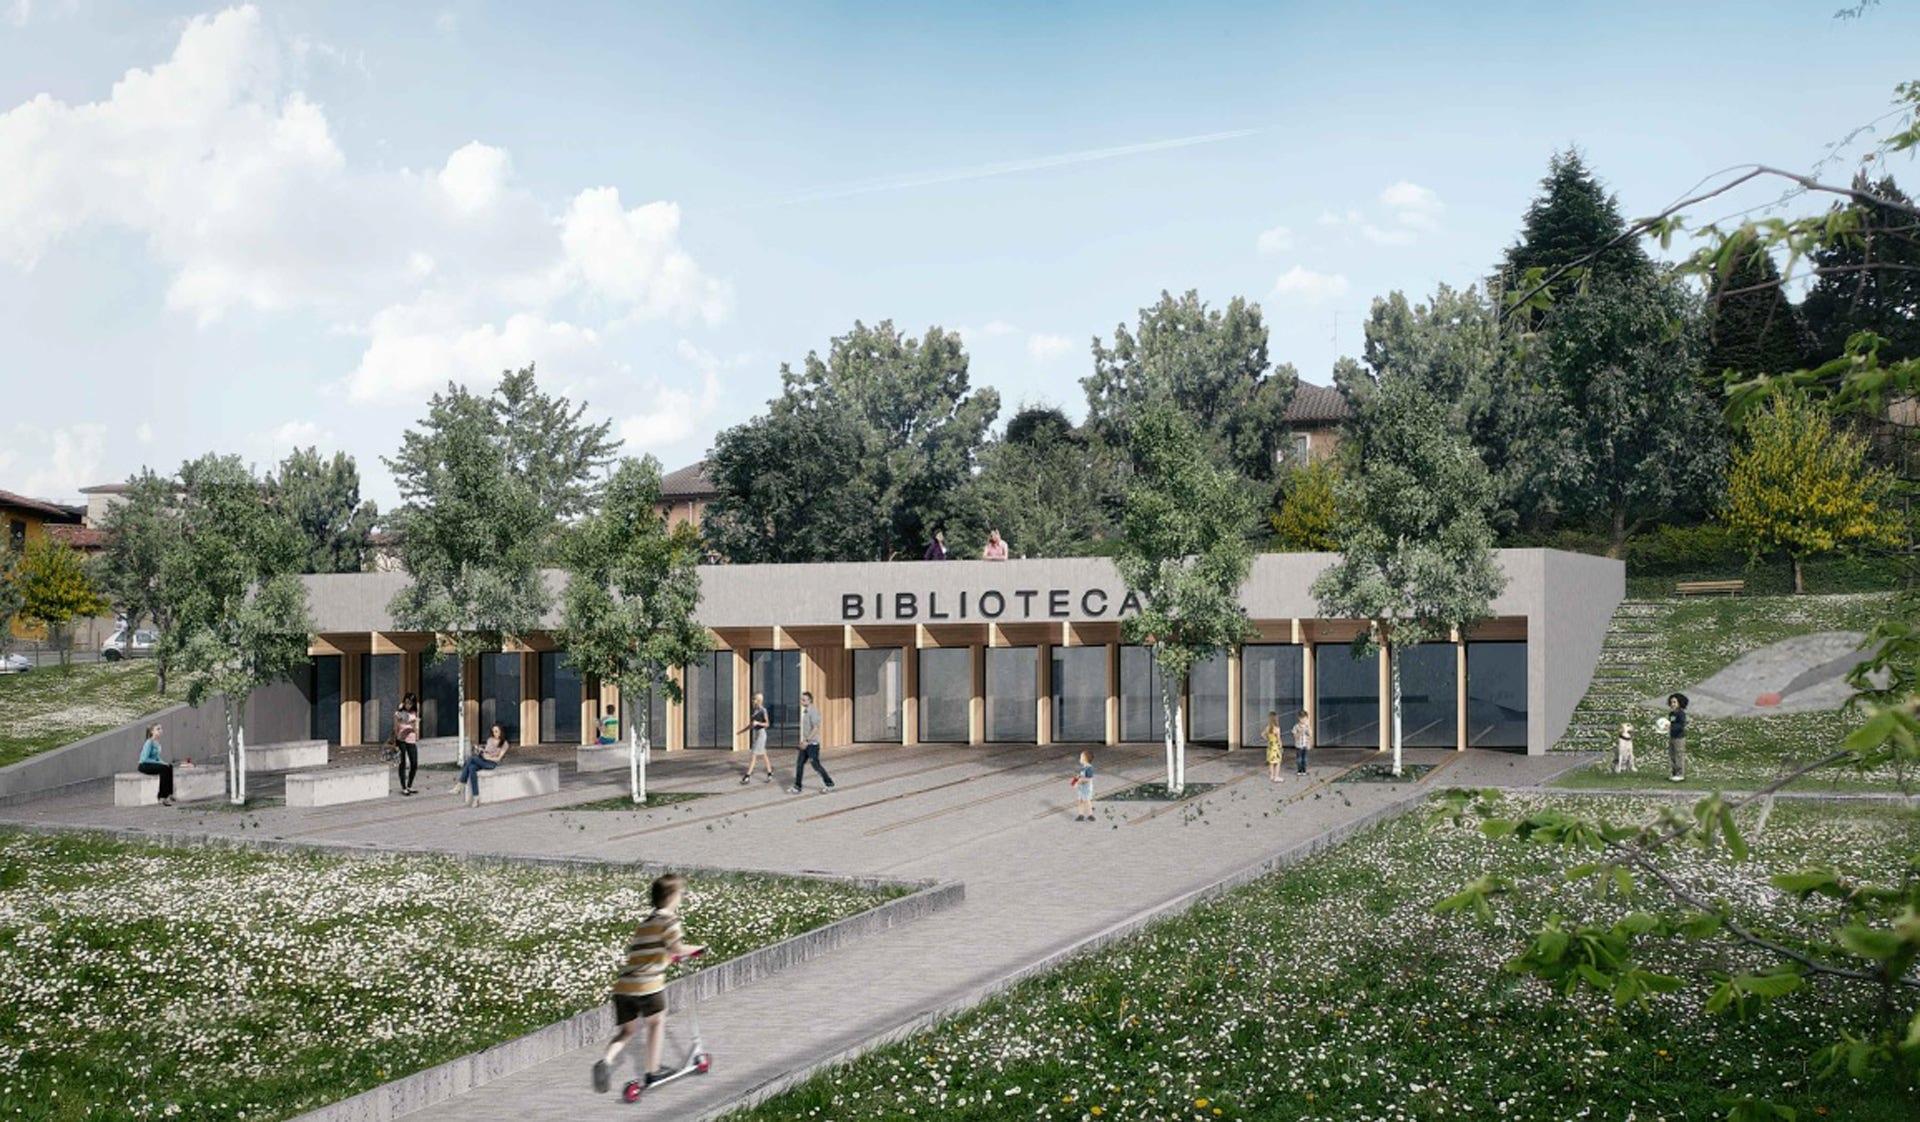 Competition Library in Briosco